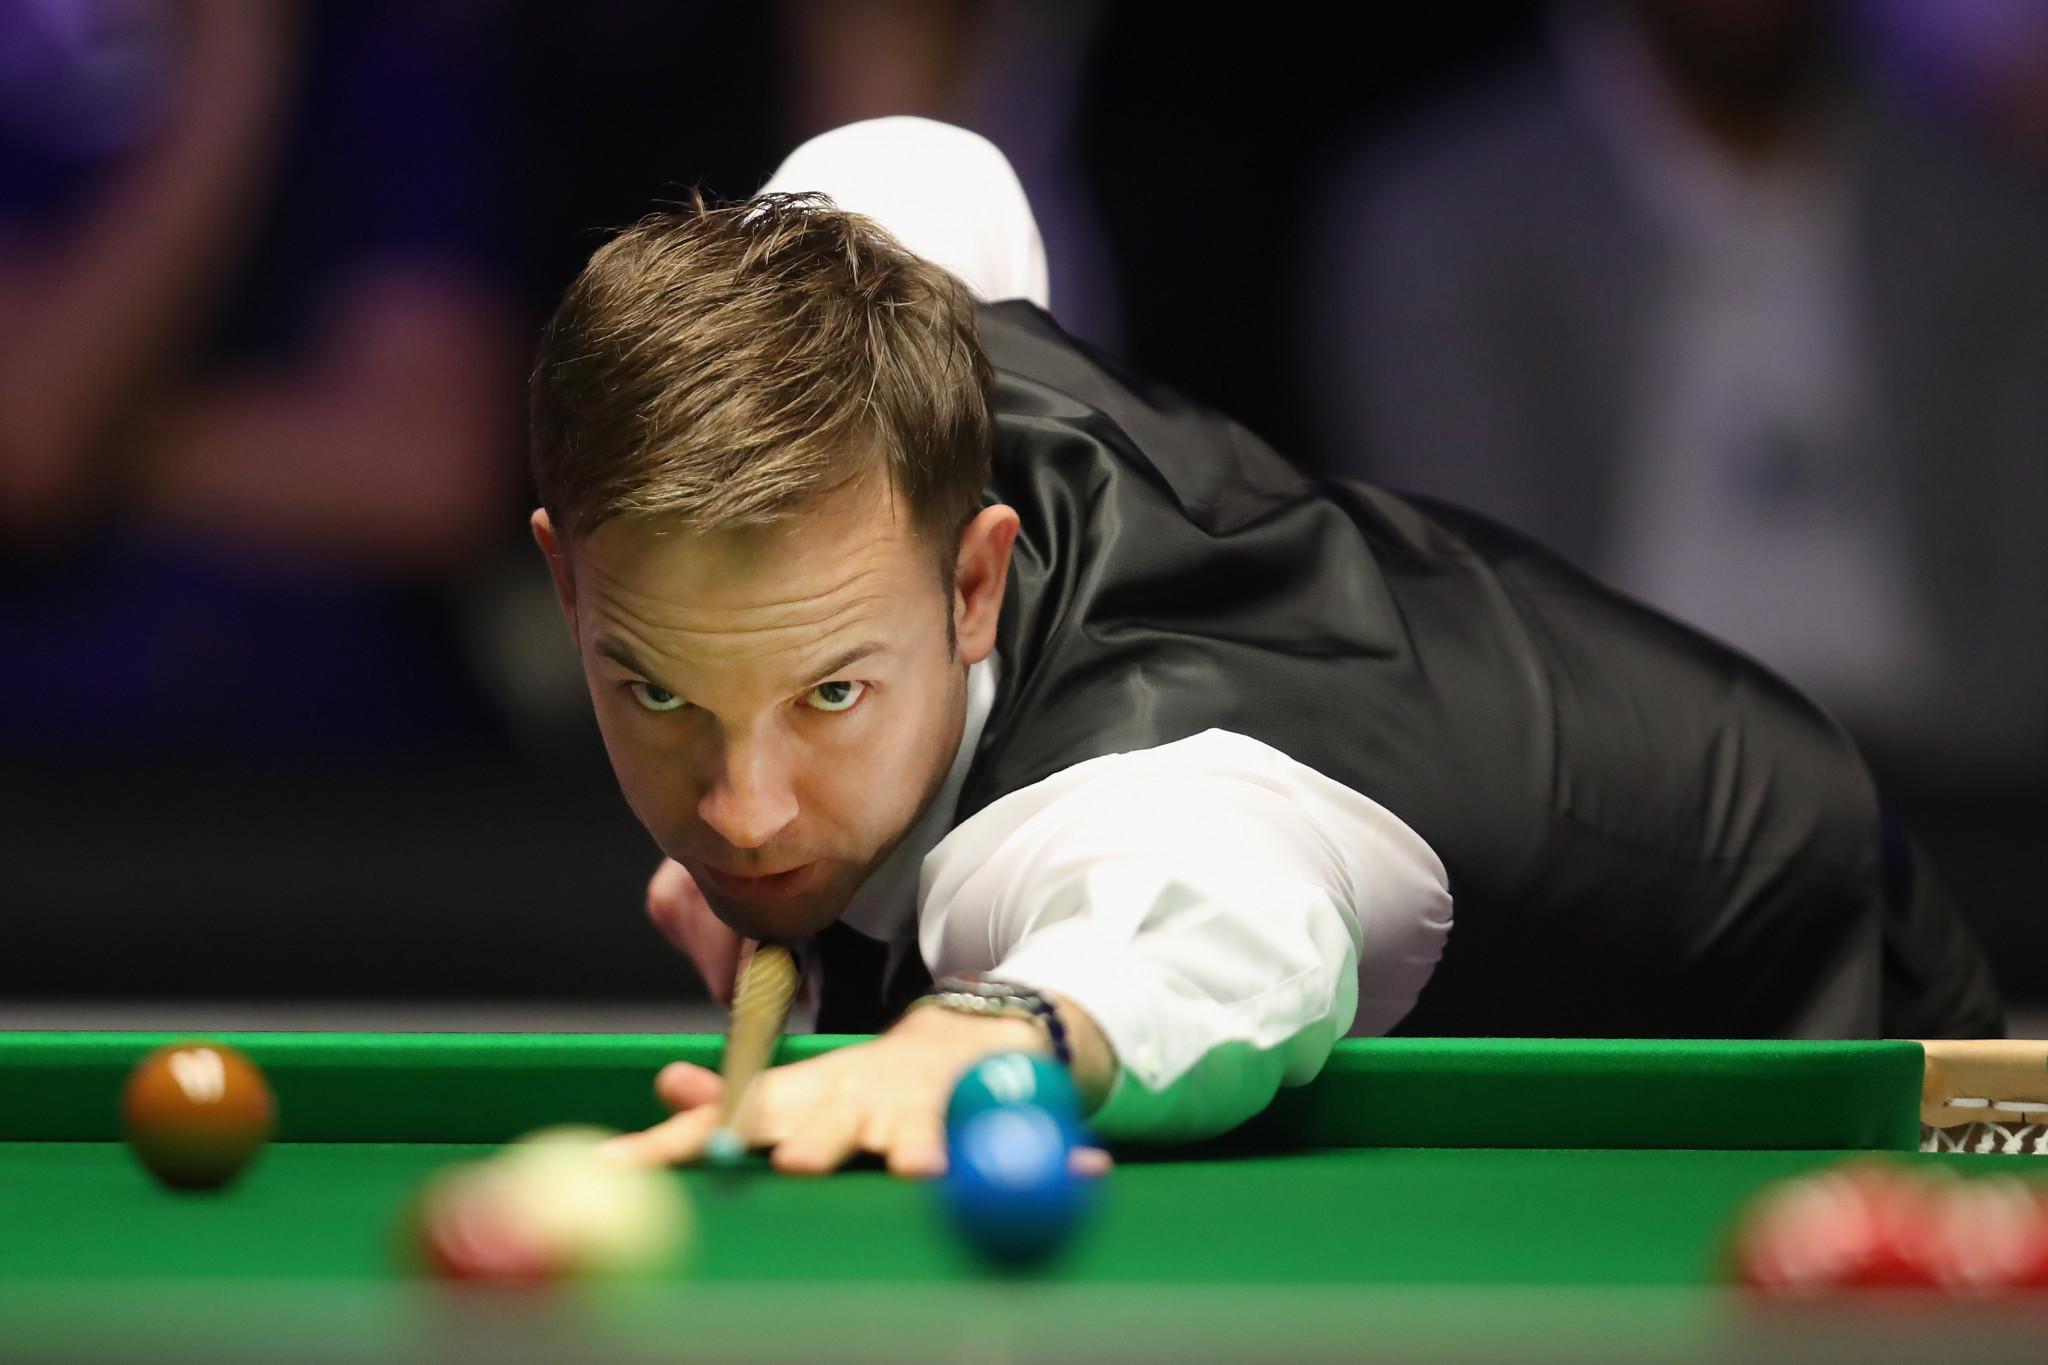 Carter eliminates five-time winner O'Sullivan from World Snooker Championships